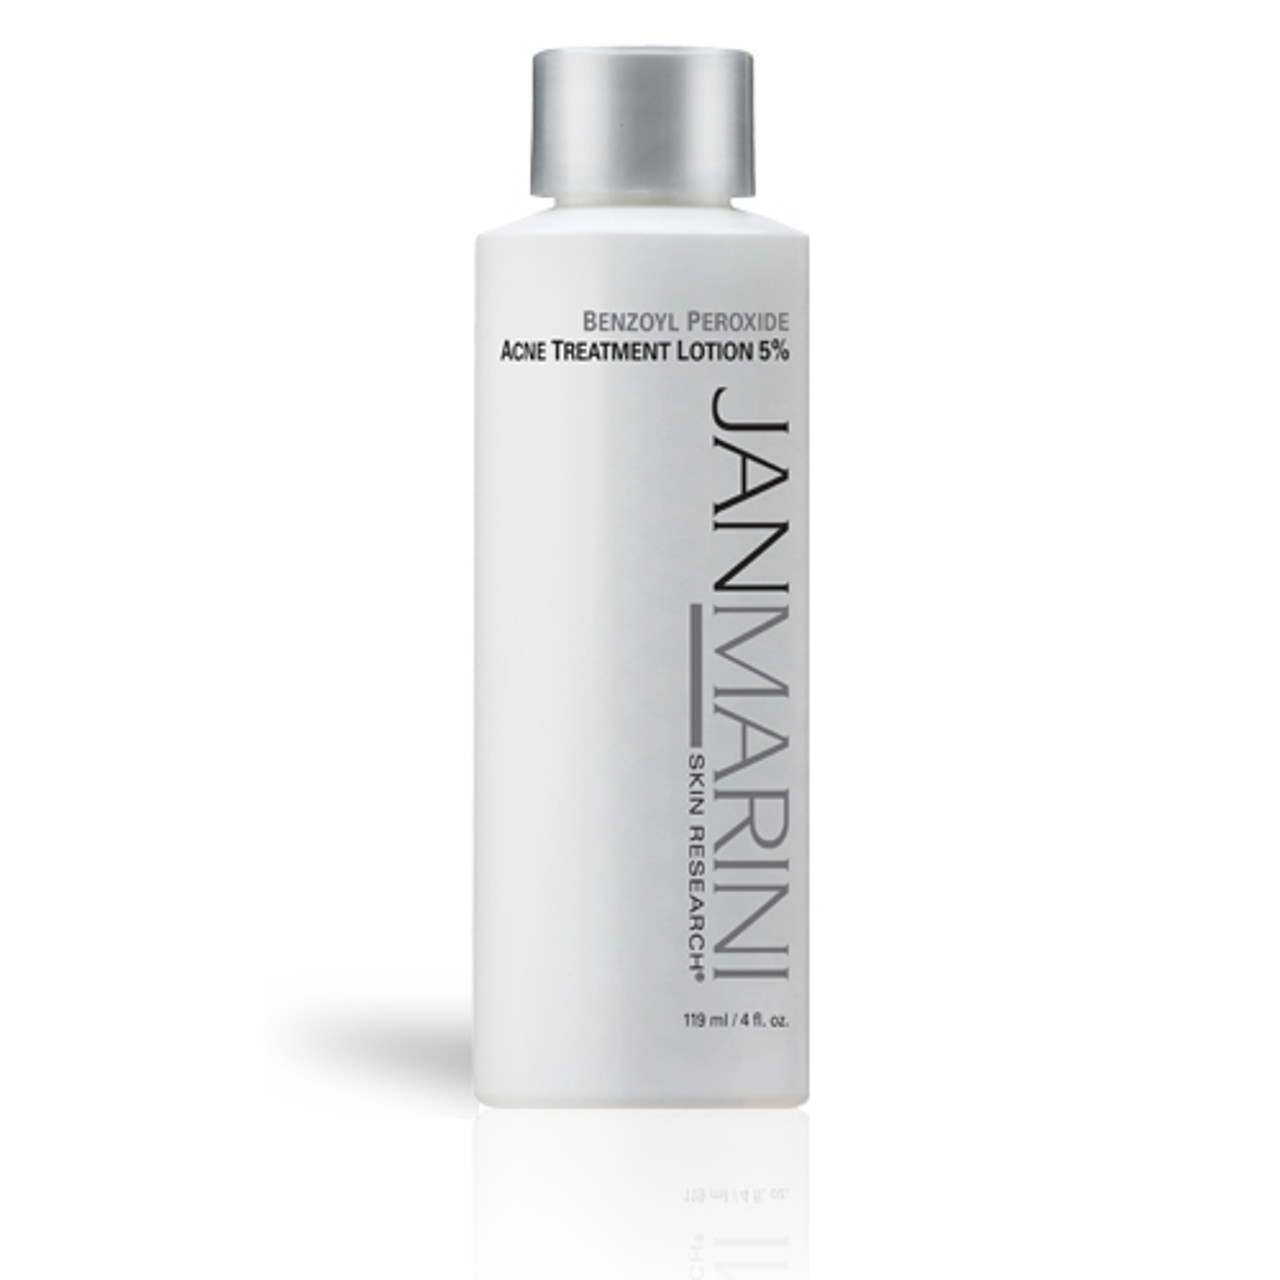 Jan Marini Benzoyl Peroxide Acne Treatment Lotion